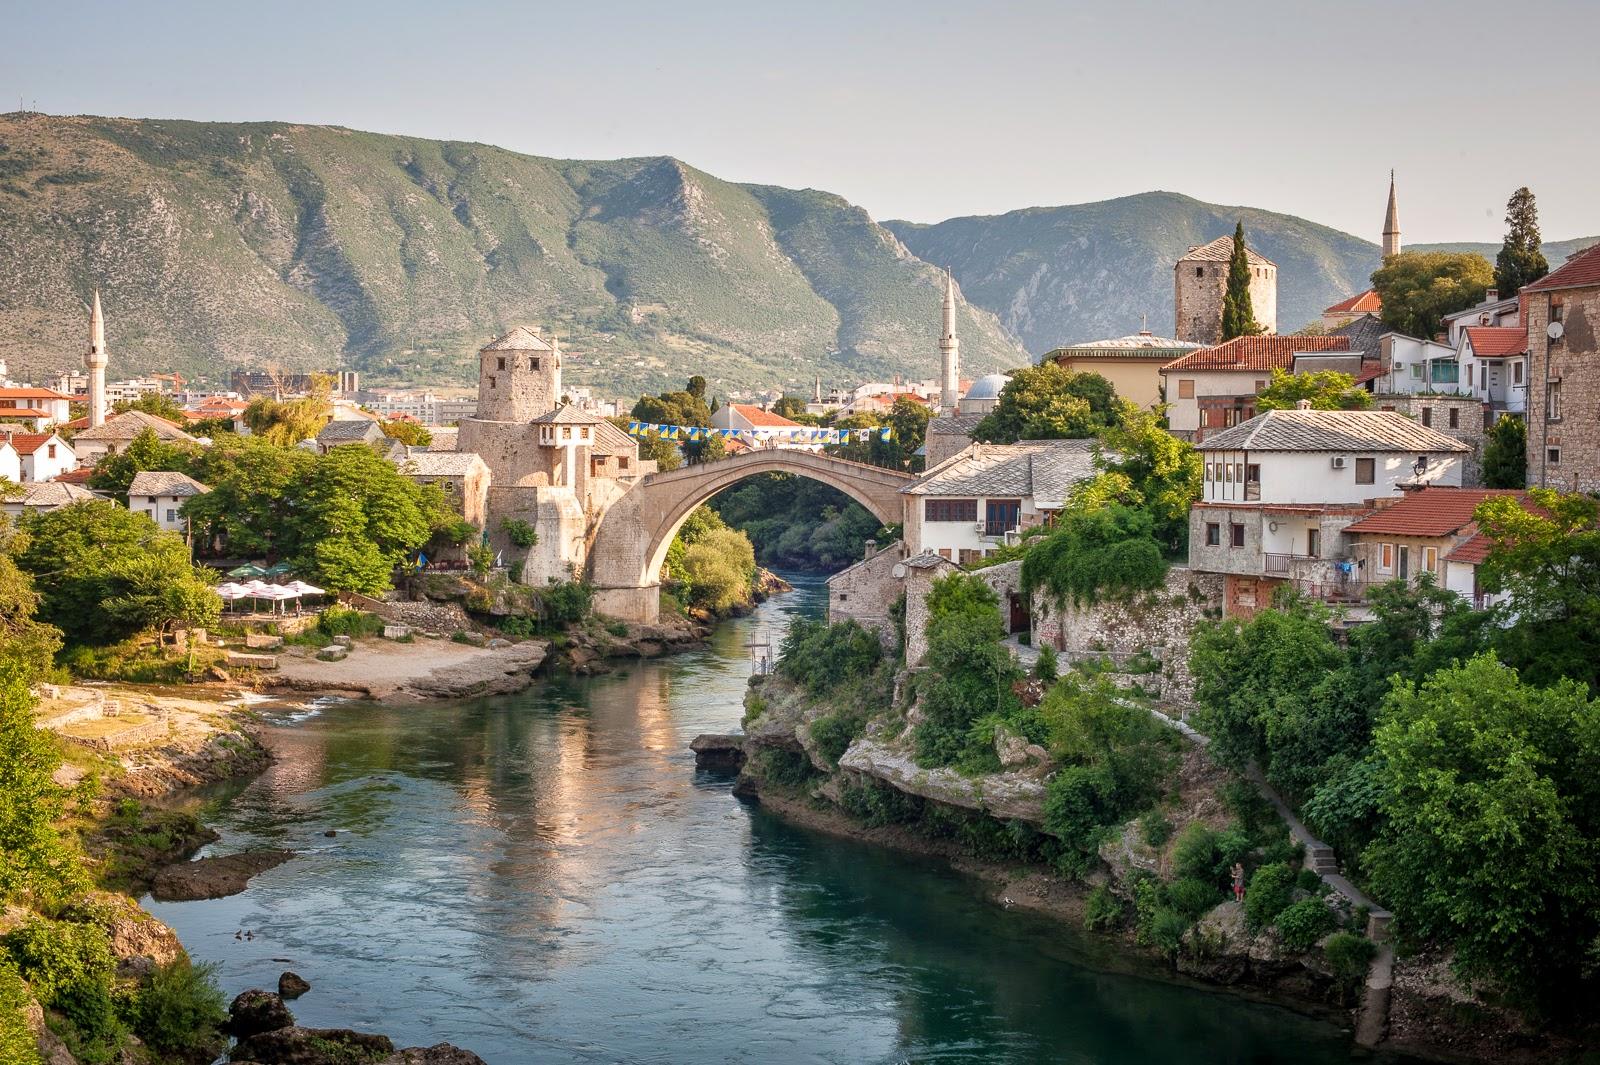 VacationTravelAdventure: Stari Most v.2, Mostar, Bosnia ...  VacationTravelA...